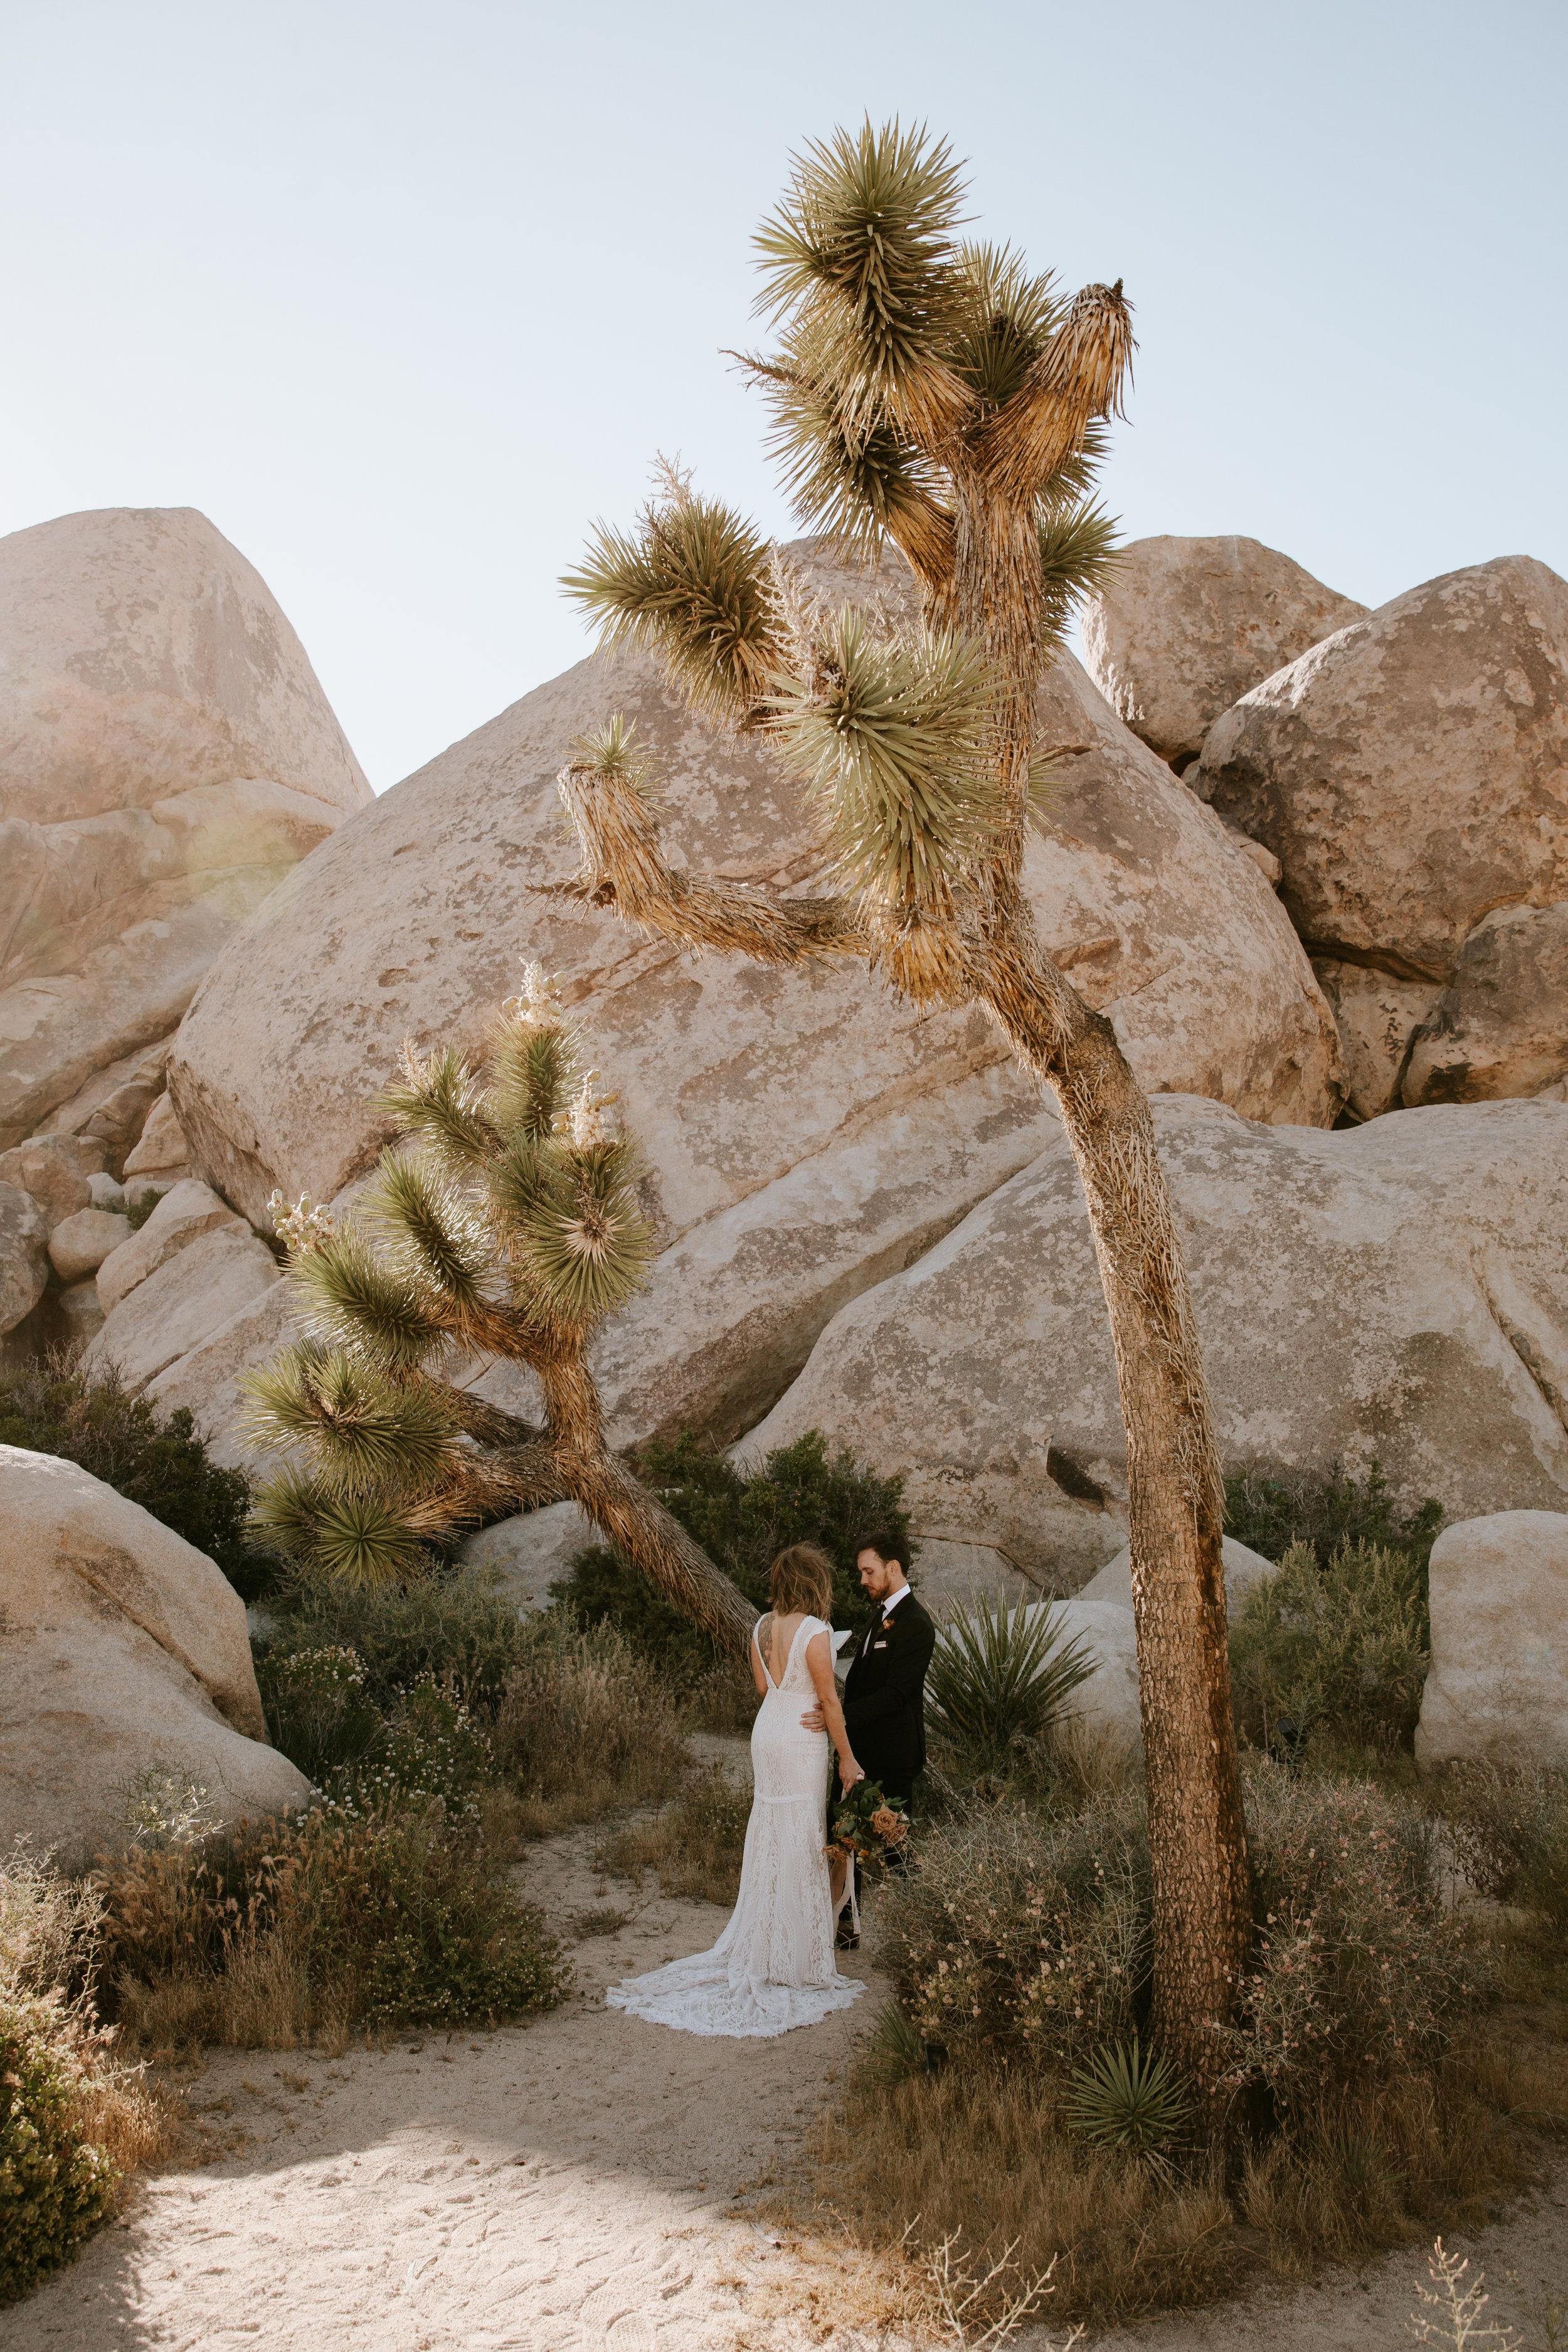 2019-05-26_Callie-Evan_Wedding_Joshua Tree_Paige Nelson_PREVIEWS HR-31.jpg